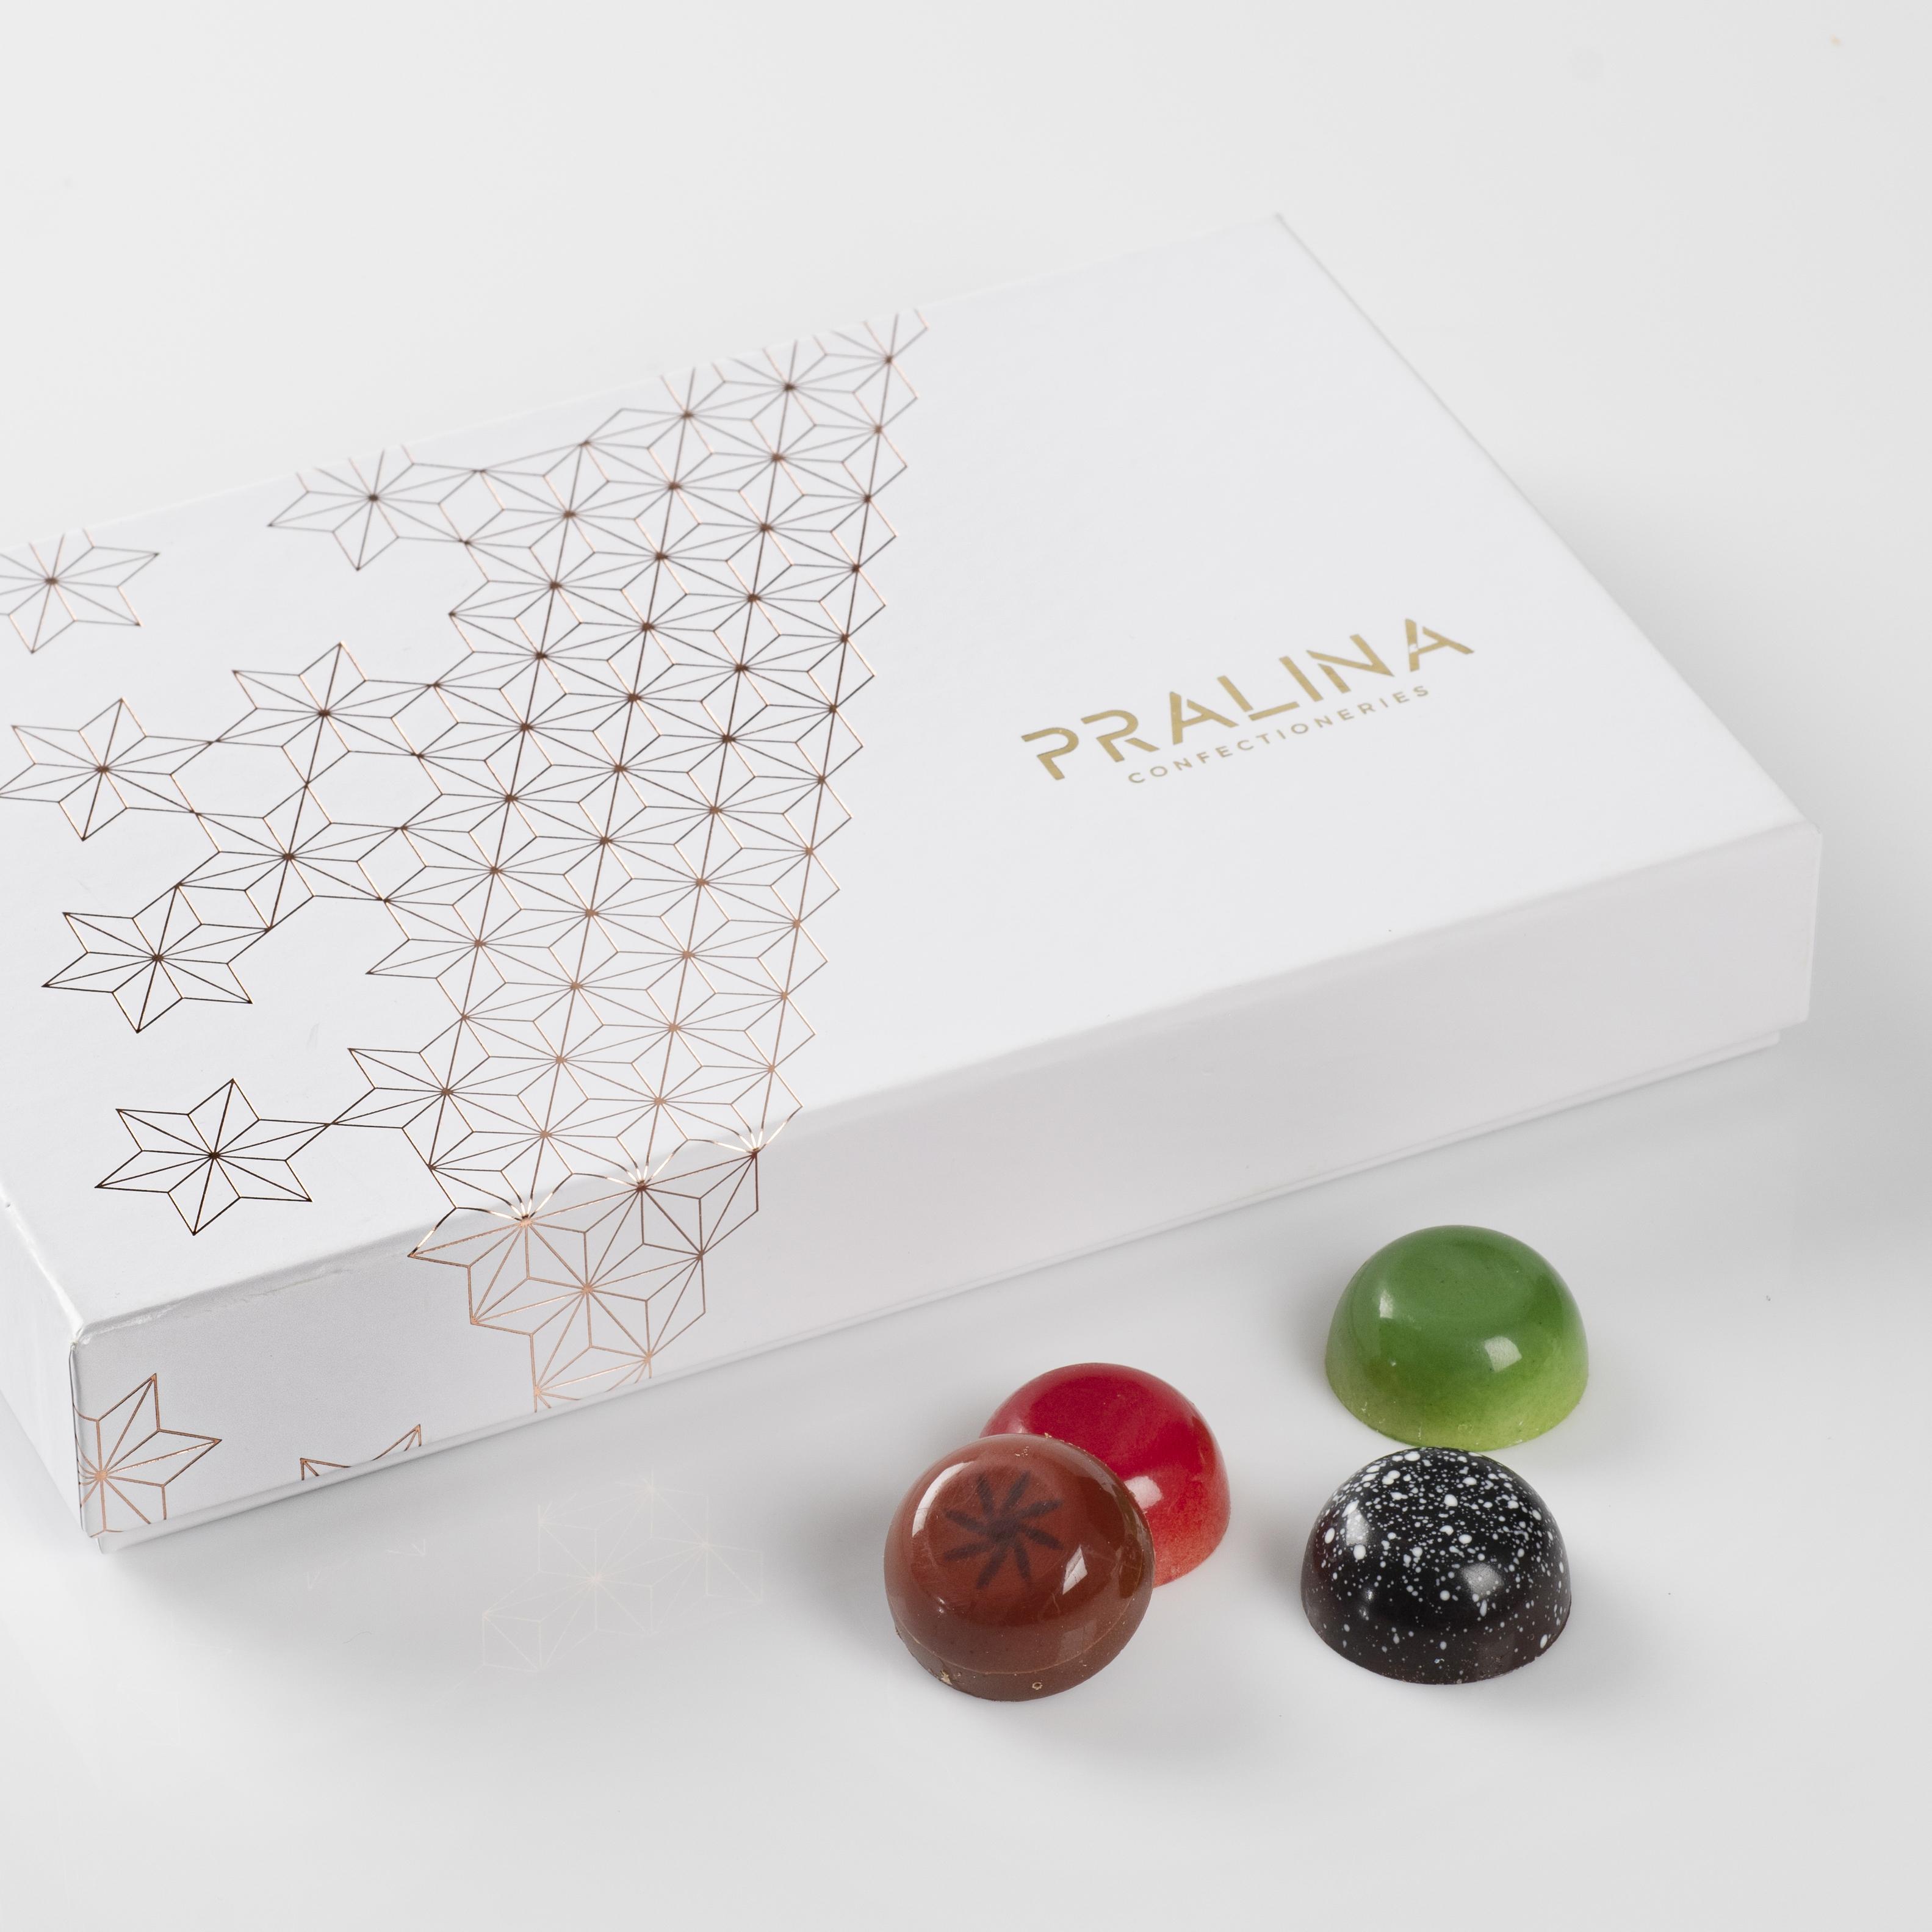 Chocolate Bonbons - Box of 36